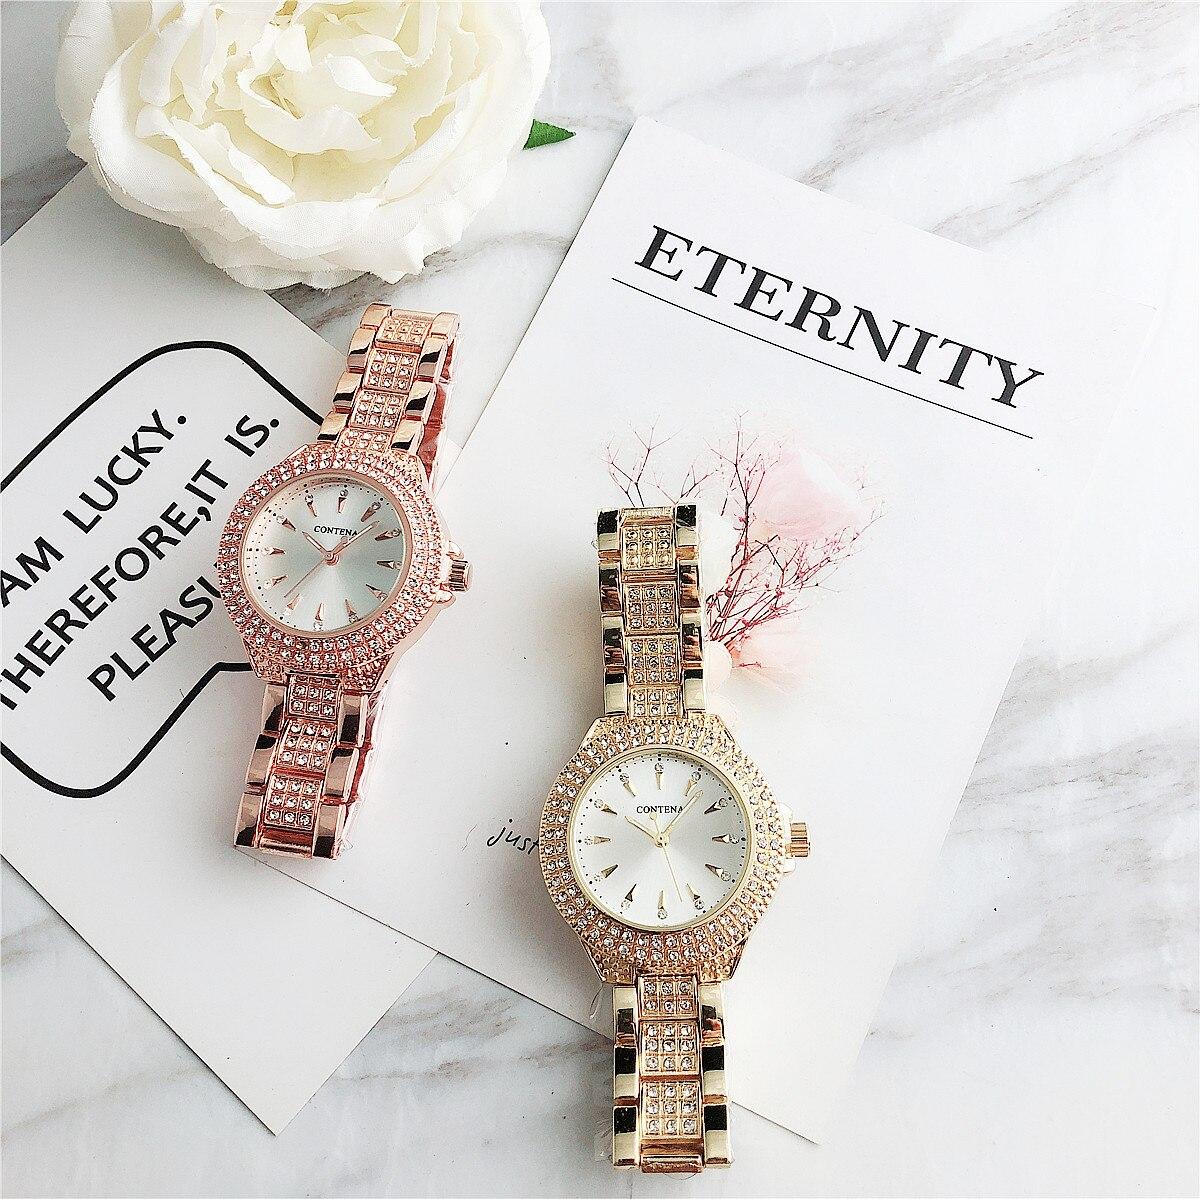 Contena nouveaute montres cuarzo Mujer cristal Relojes Montre de lujo Mujer damas strass